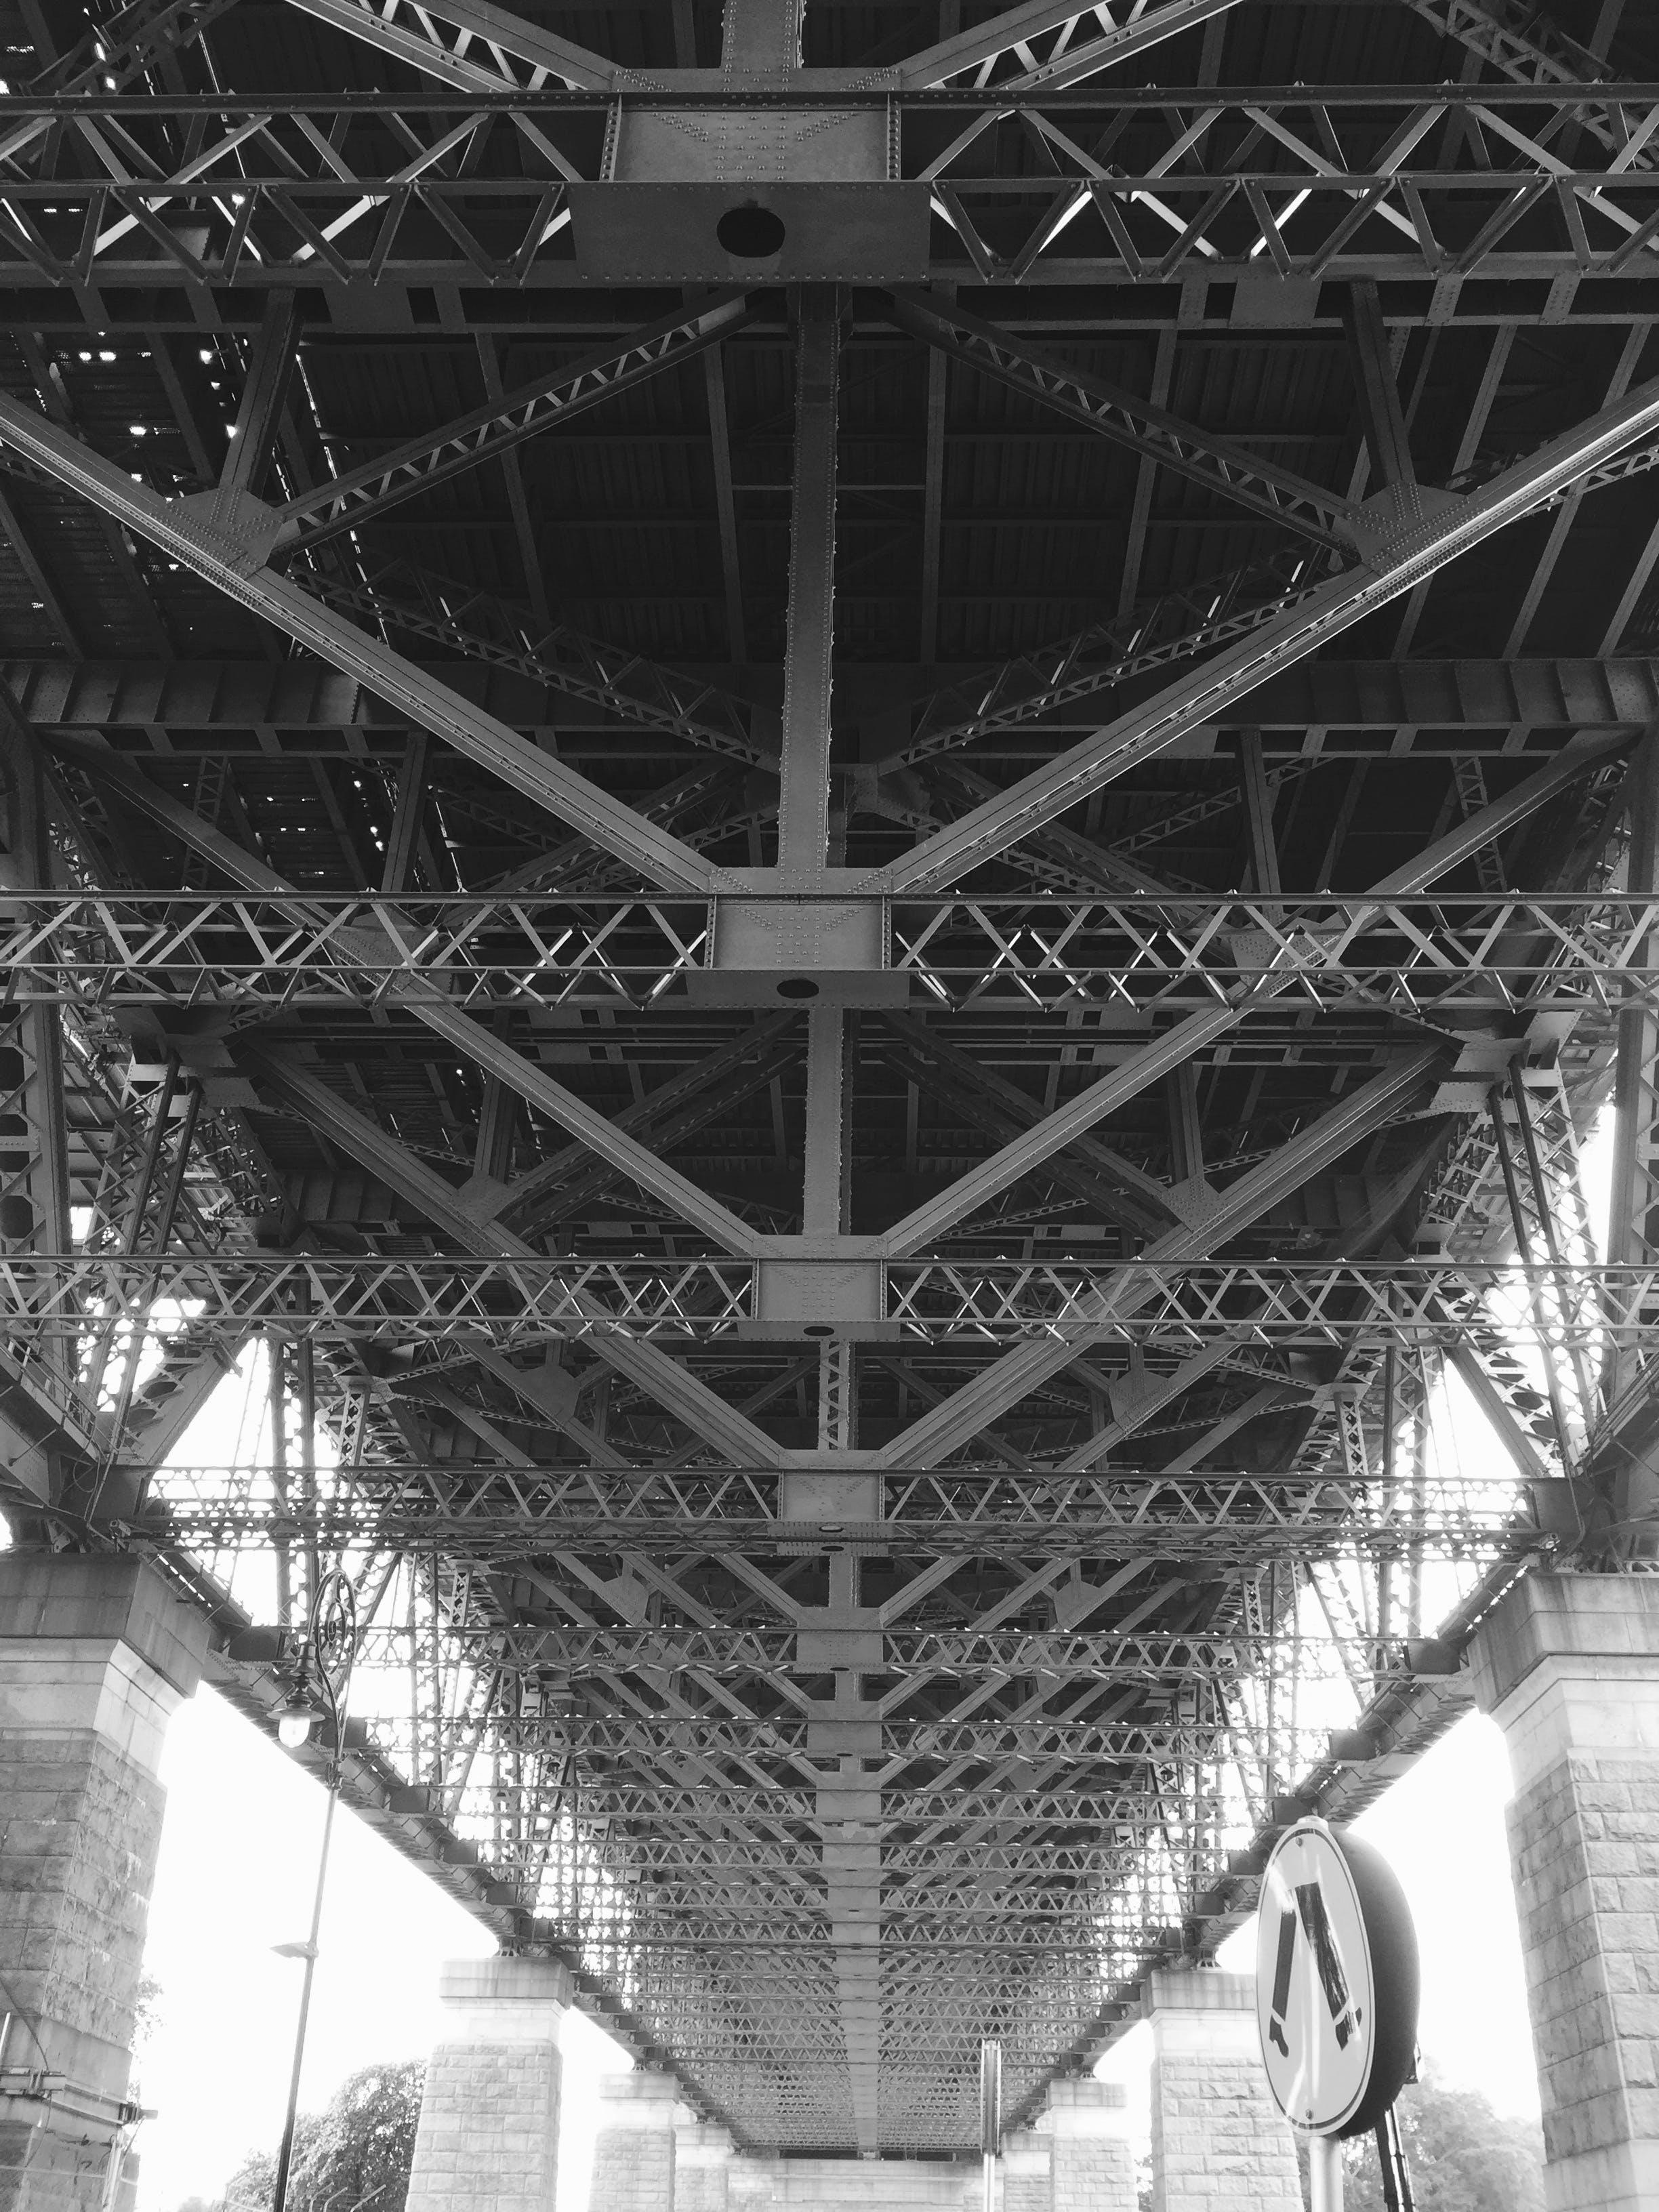 Grayscale Photo of Bridge Frame